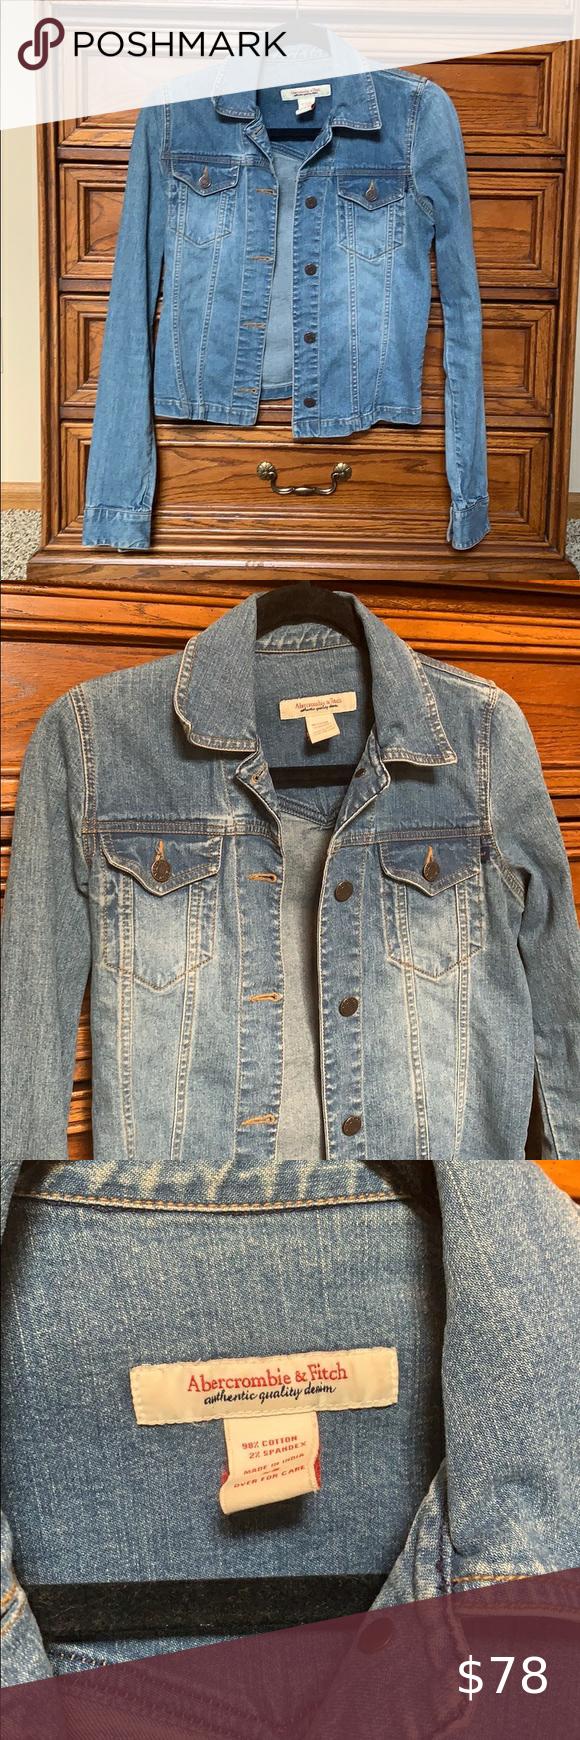 Vintage Abercrombie Fitch Denim Jacket Denim Jacket Clothes Design Fashion Design